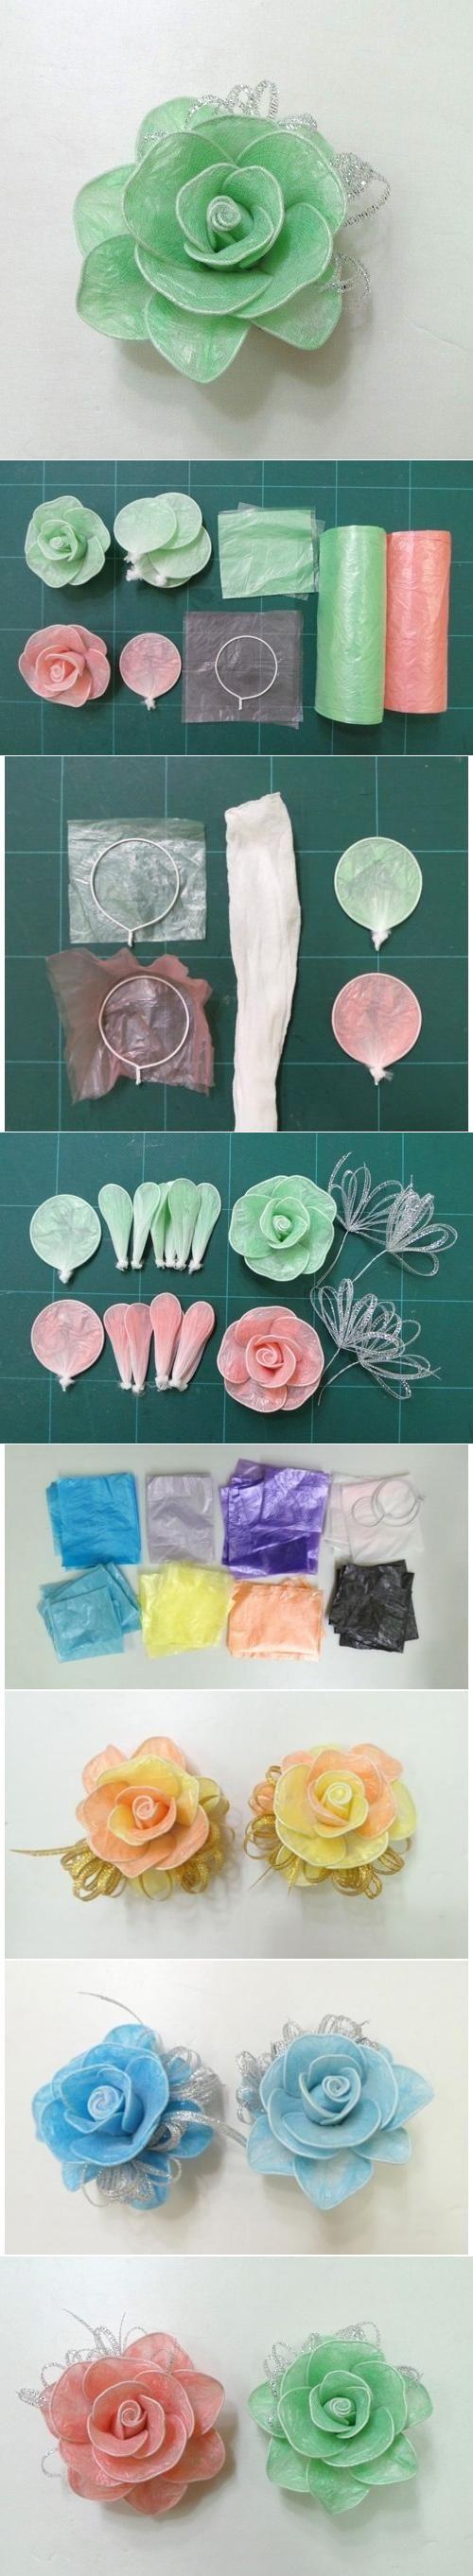 DIY Plastic Bag Roses DIY Projects | UsefulDIY.com Follow us on Facebook ==> https://www.facebook.com/UsefulDiy